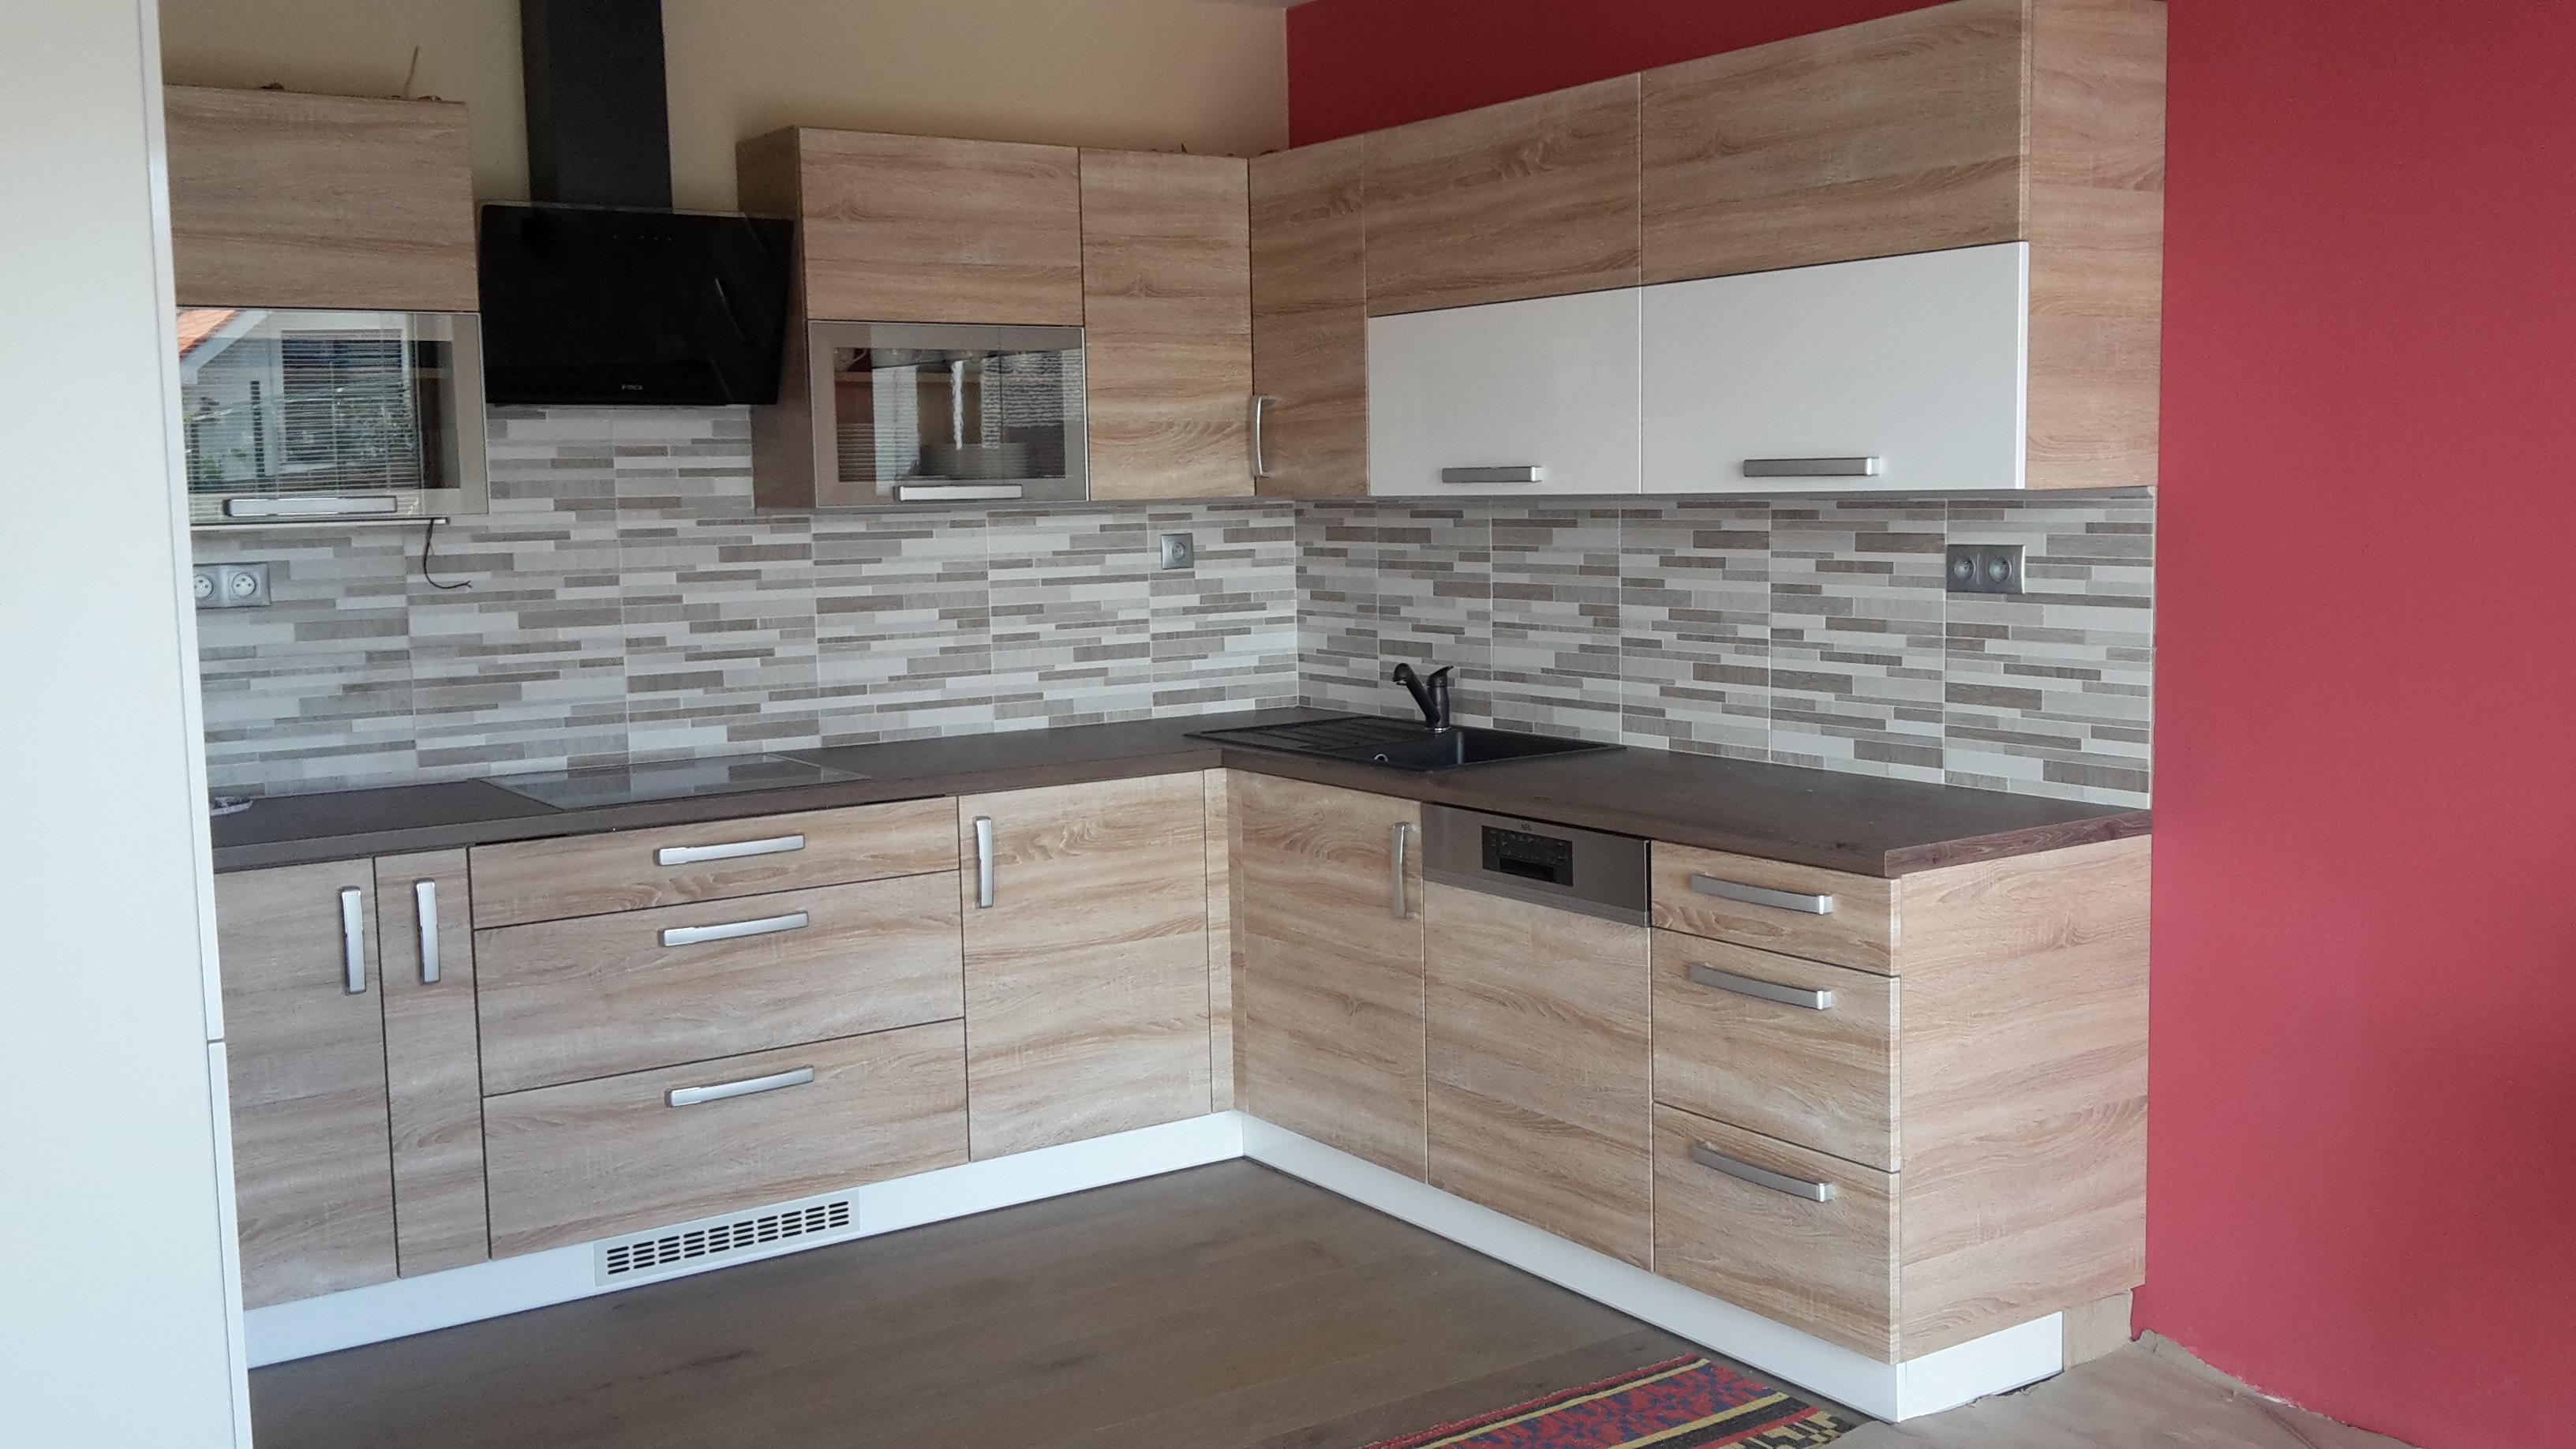 hnedá podlaha, bordová stena v kuchyni